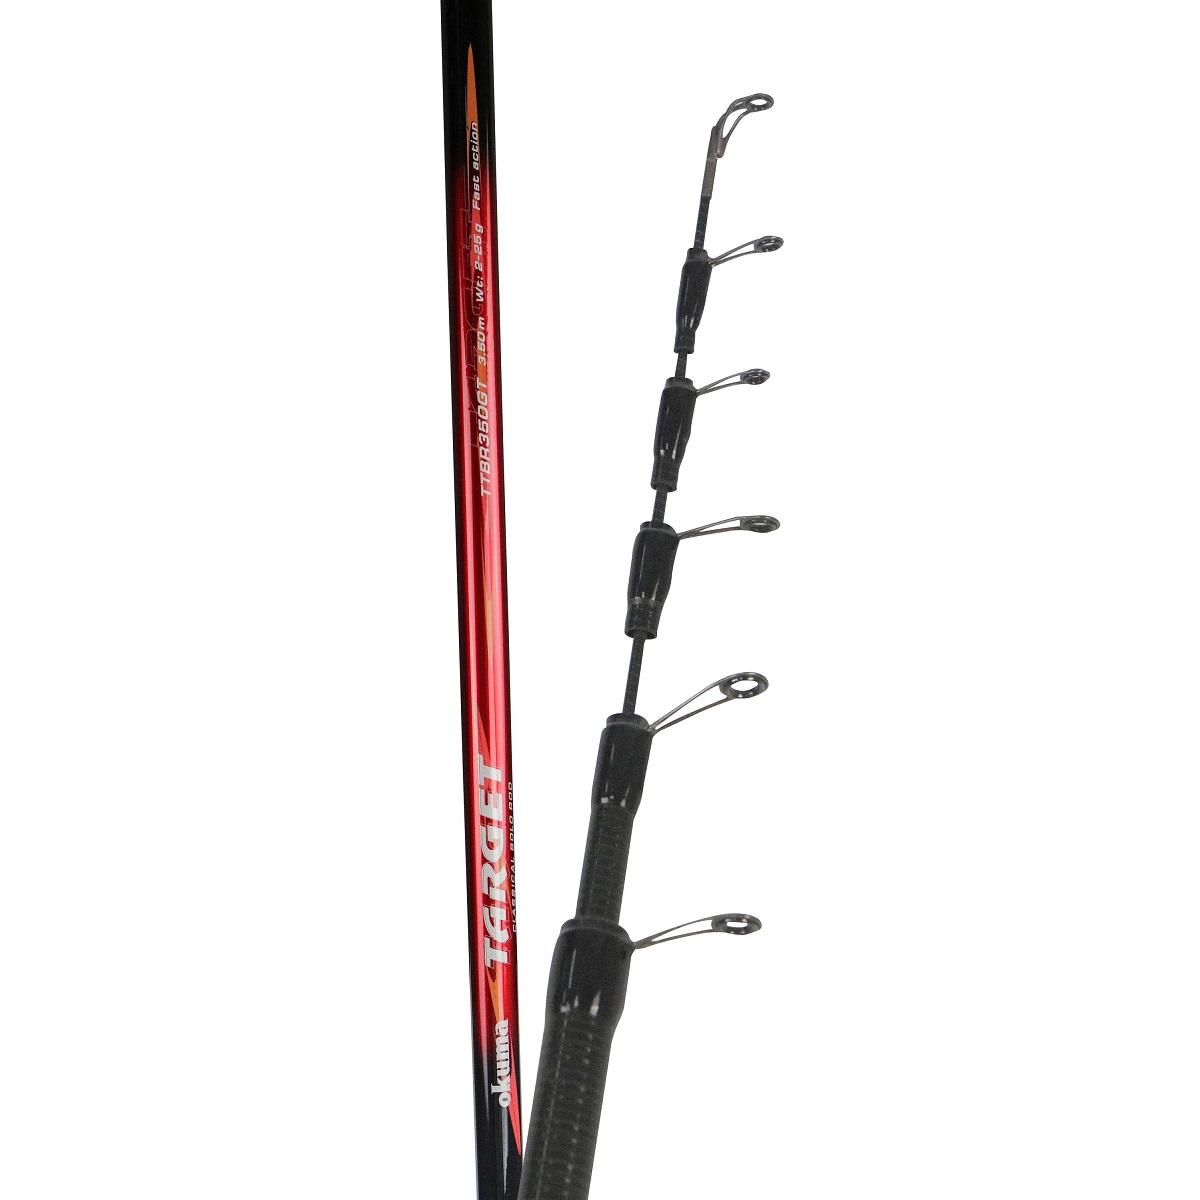 Int int 2018 new okuma fishing i tamburi okuma for Target fishing pole